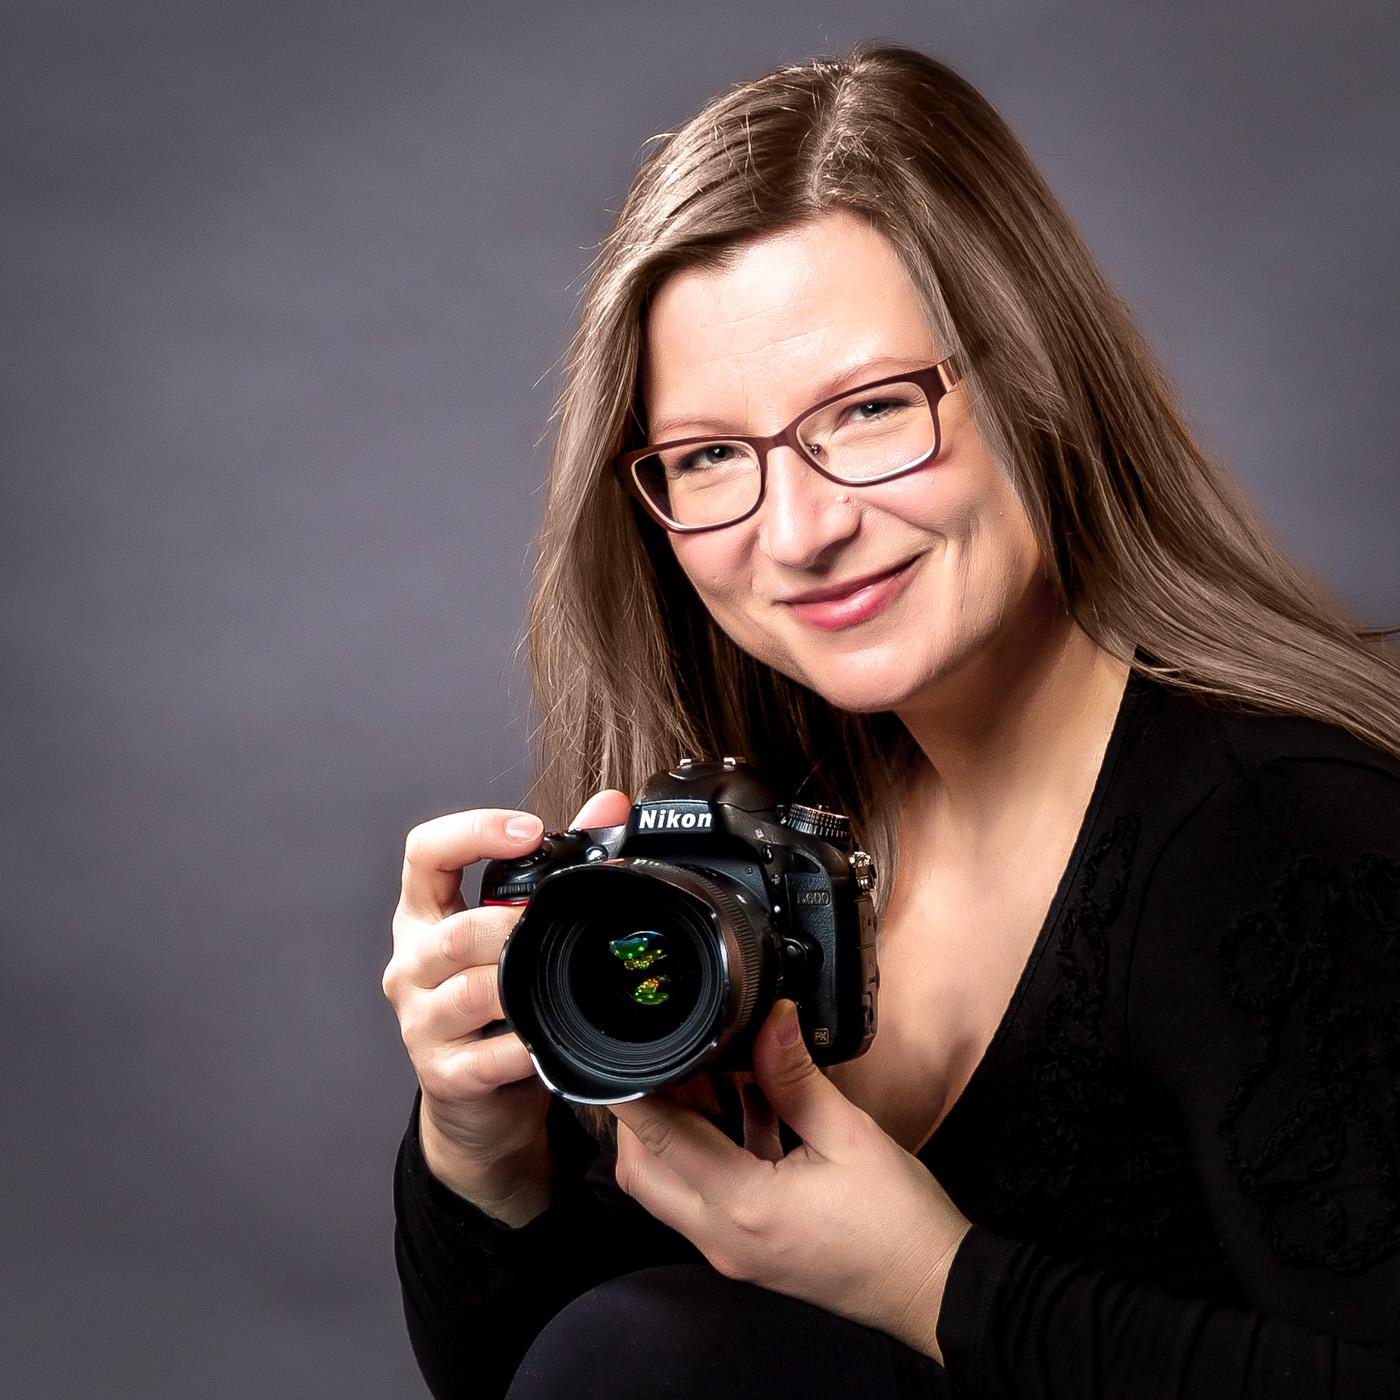 ich - Cordula Maria Grahl grahlfoto.de Familienfotografie Familienshootings Hochzeitsfotografie